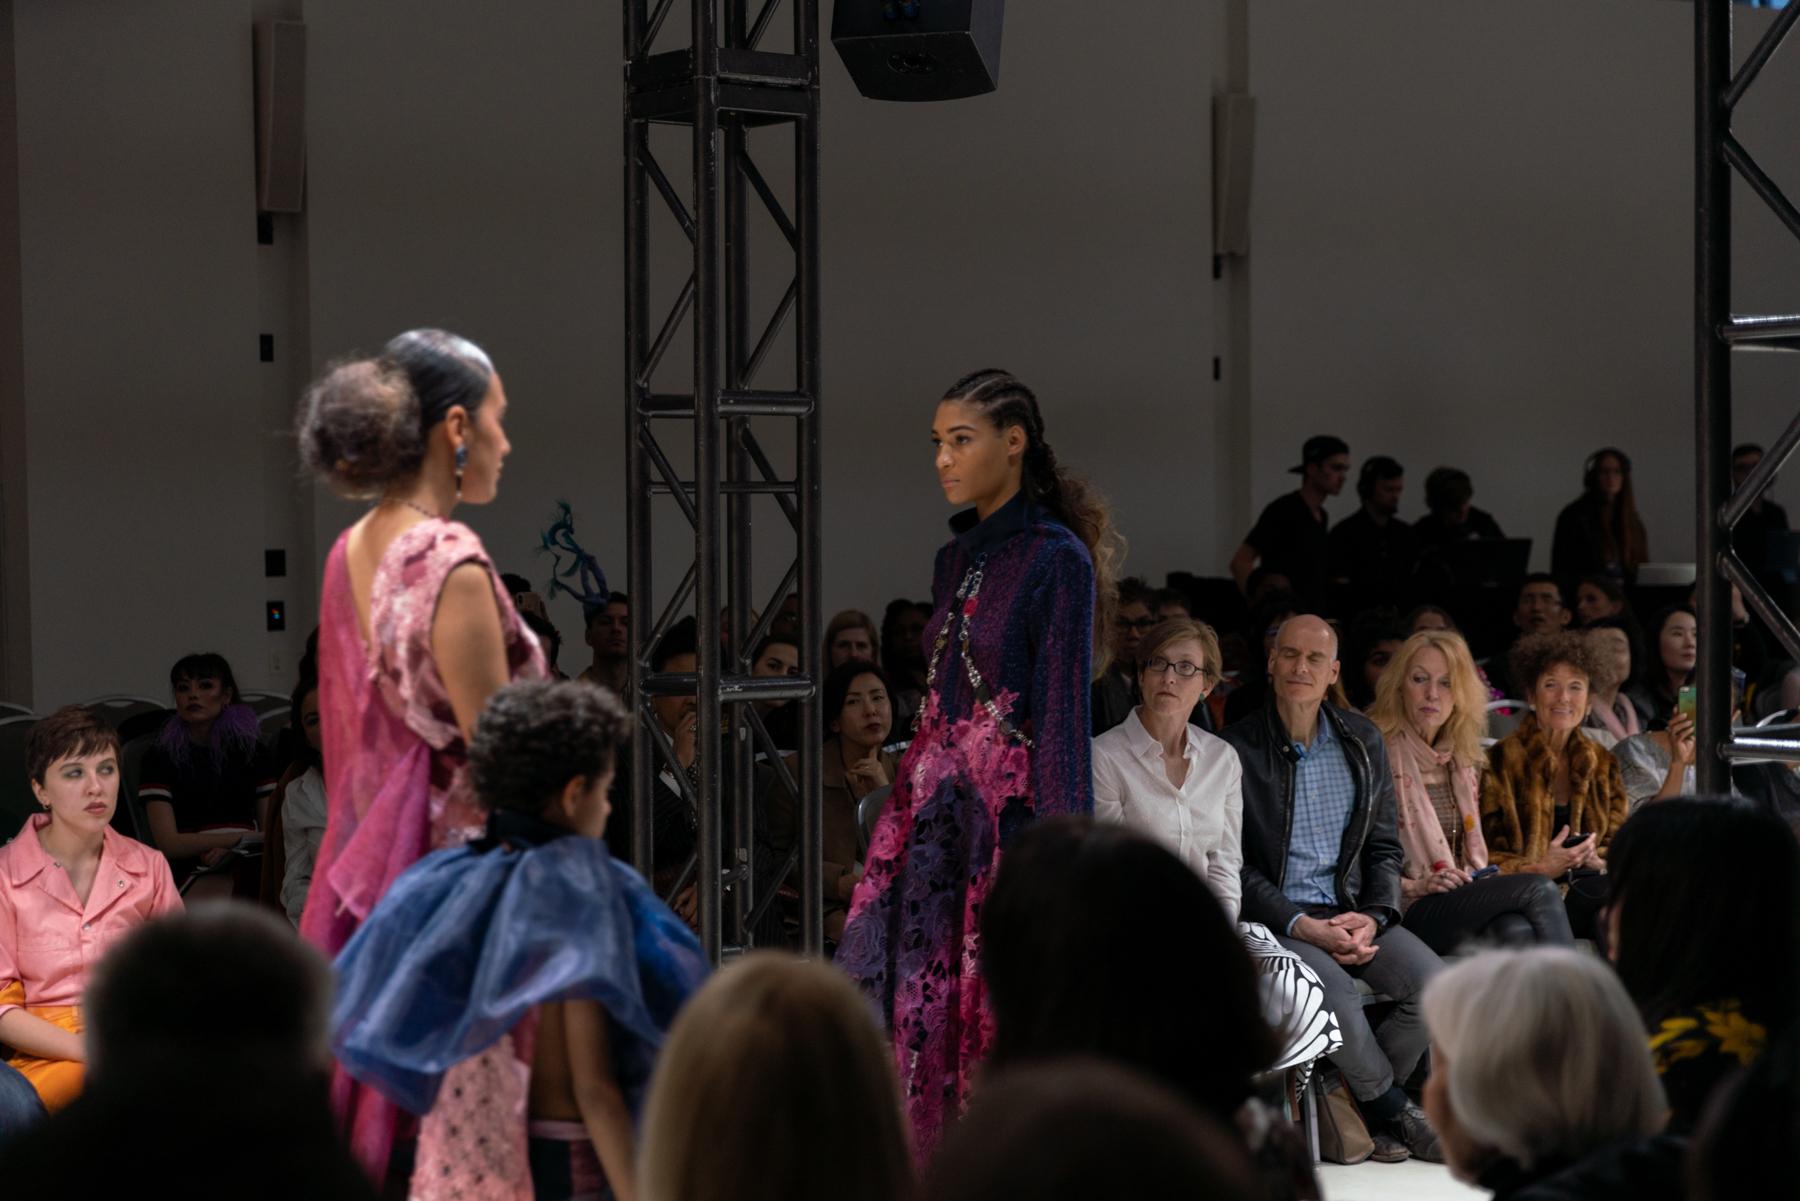 connor_fenwick_saic_fashion_event_montoya_03.jpg